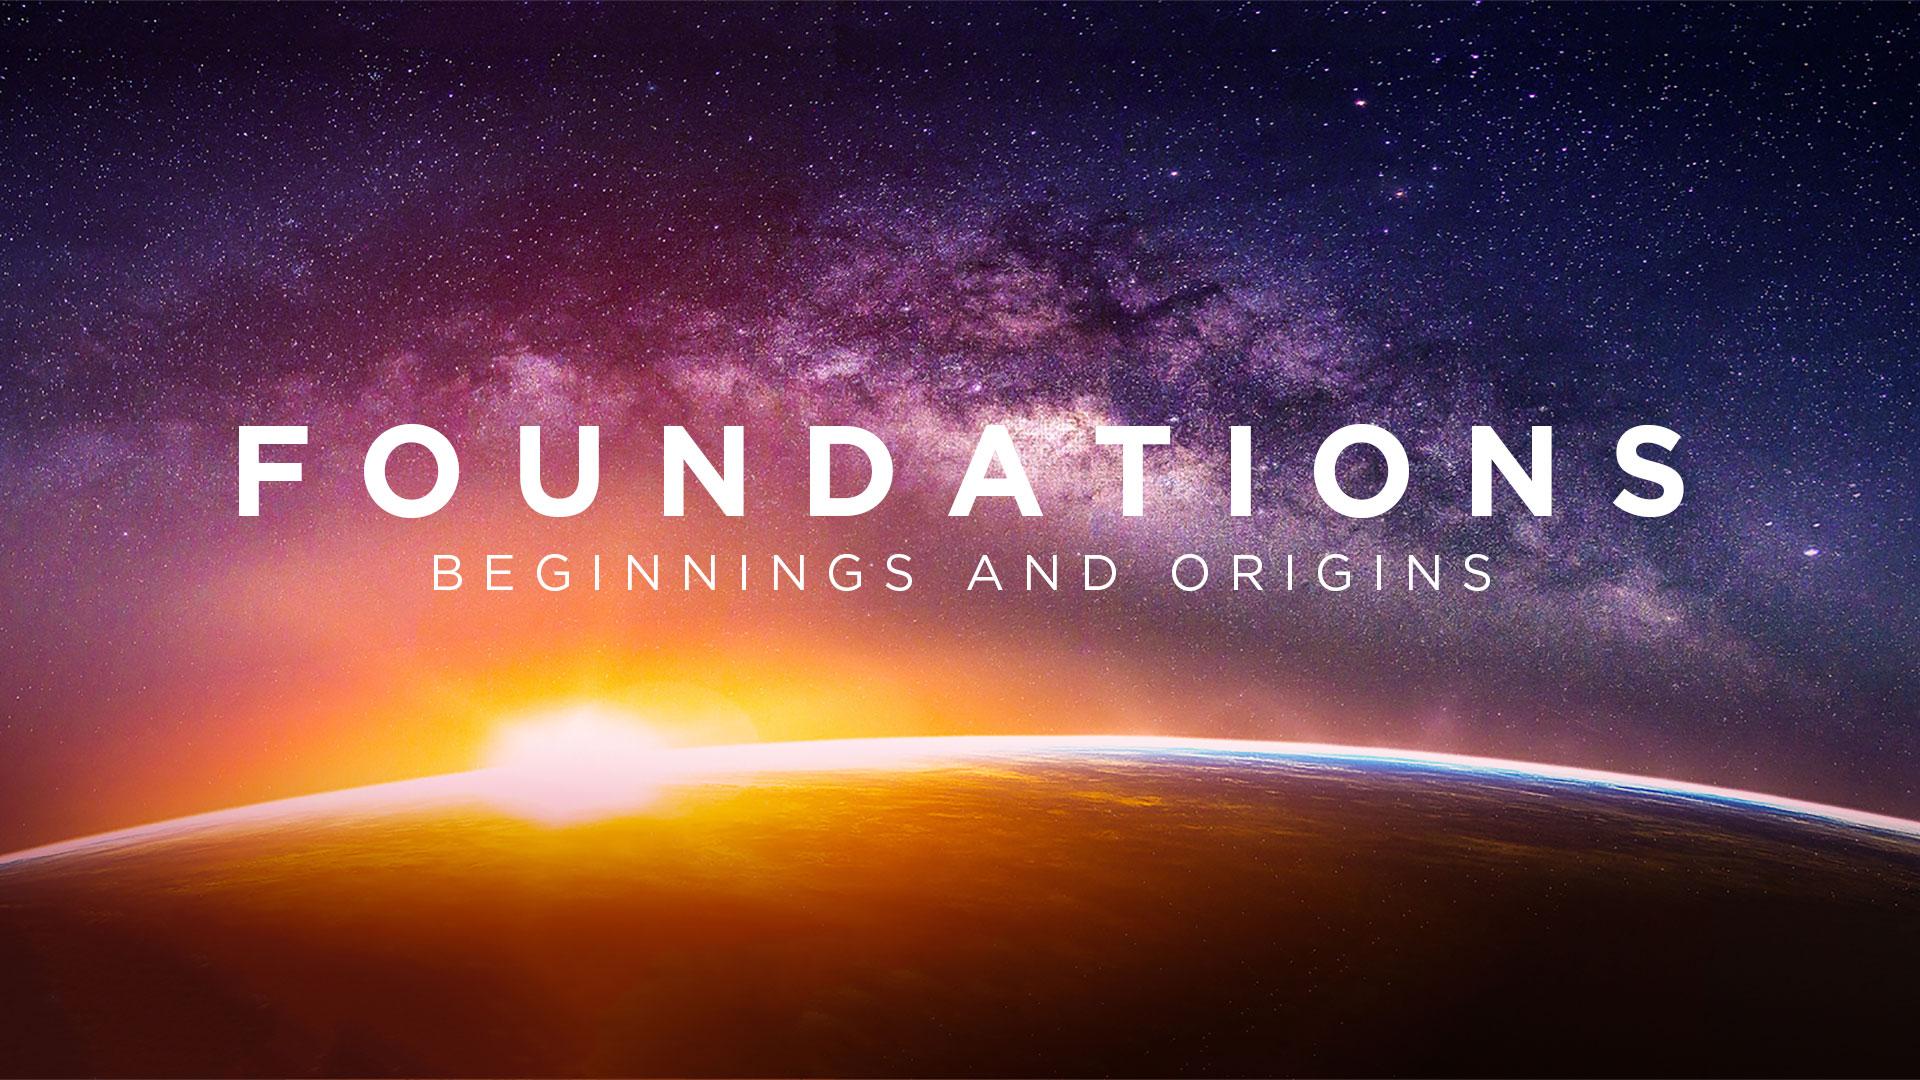 Part 18: The Beginning Of The Gospel